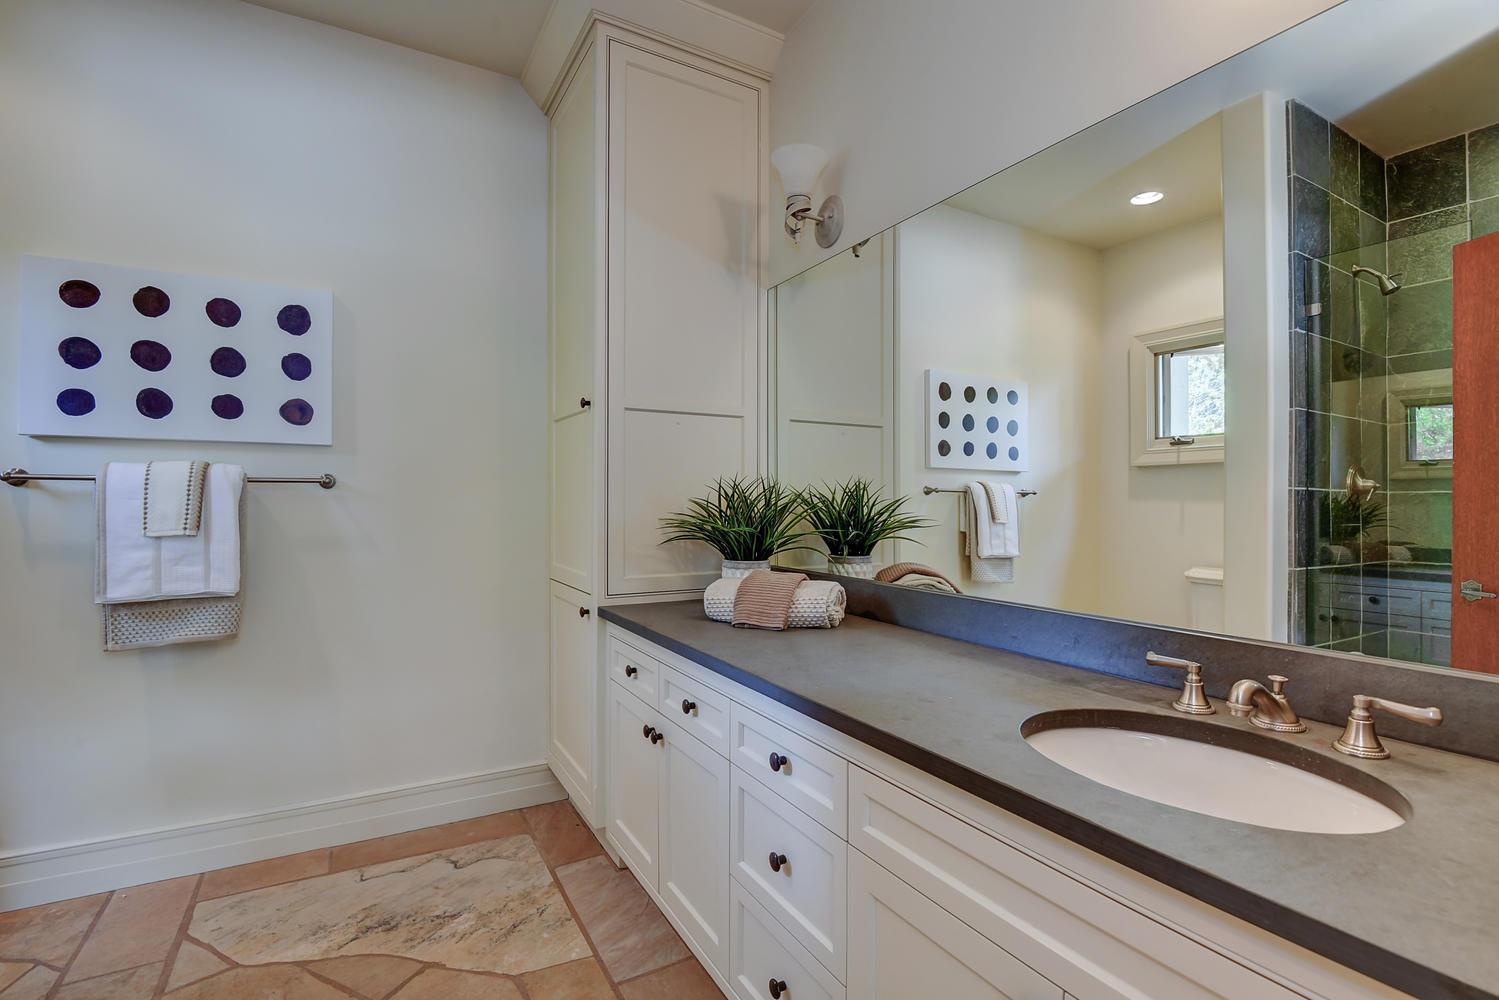 39_14833 Karl Ave Monte Sereno CA-large-061-75-Pool House Bathroom-1500x1000-72dpi.jpg